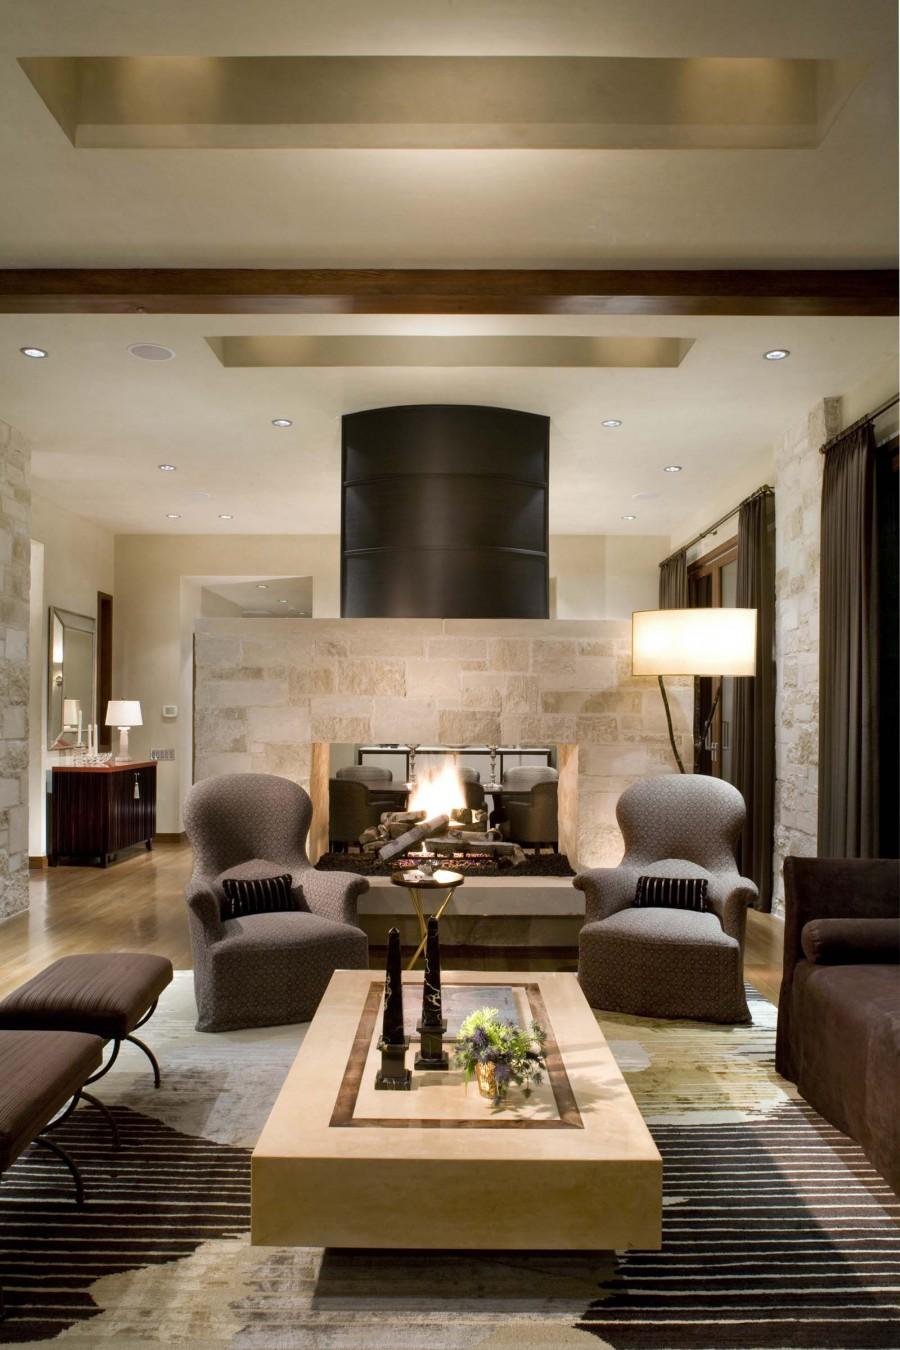 16 Fabulous Earth Tones Living Room Designs - Decoholic on Room Decore  id=48868